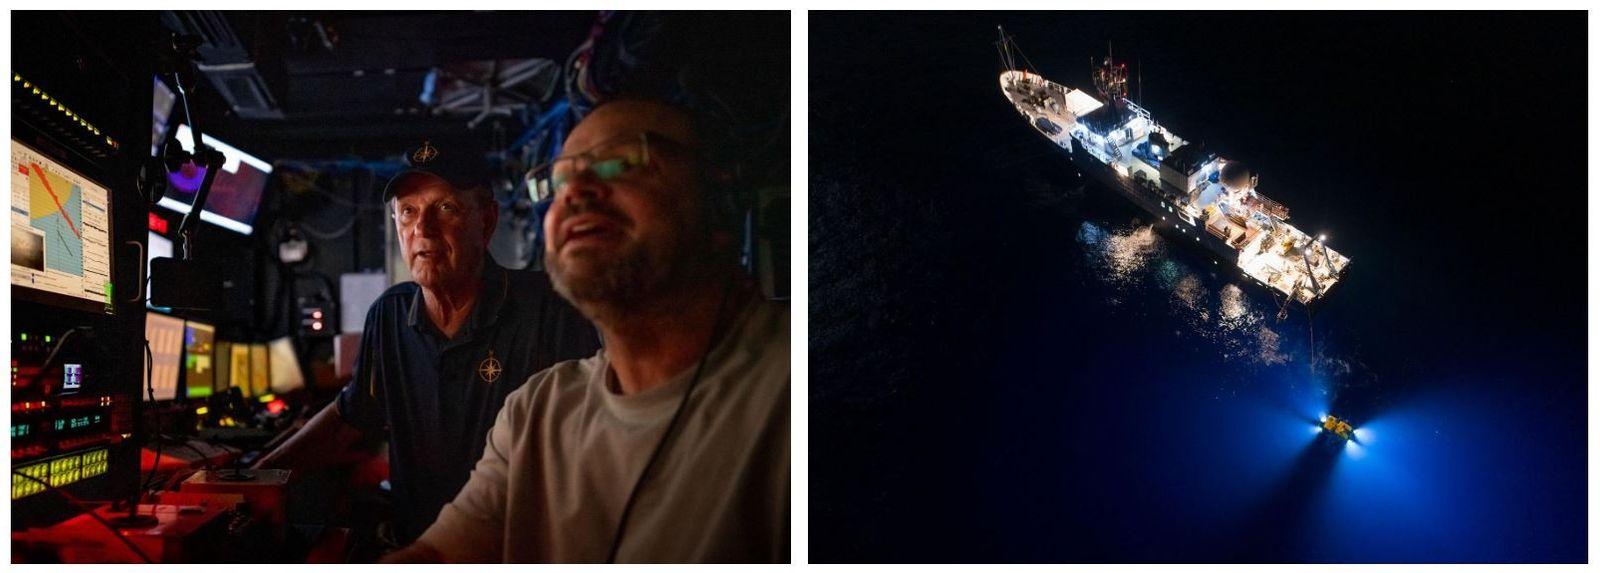 Esquerda: Na sala de controlo do Nautilus, Robert Ballard e Jeff Dennerline monitorizam o trabalho de ...